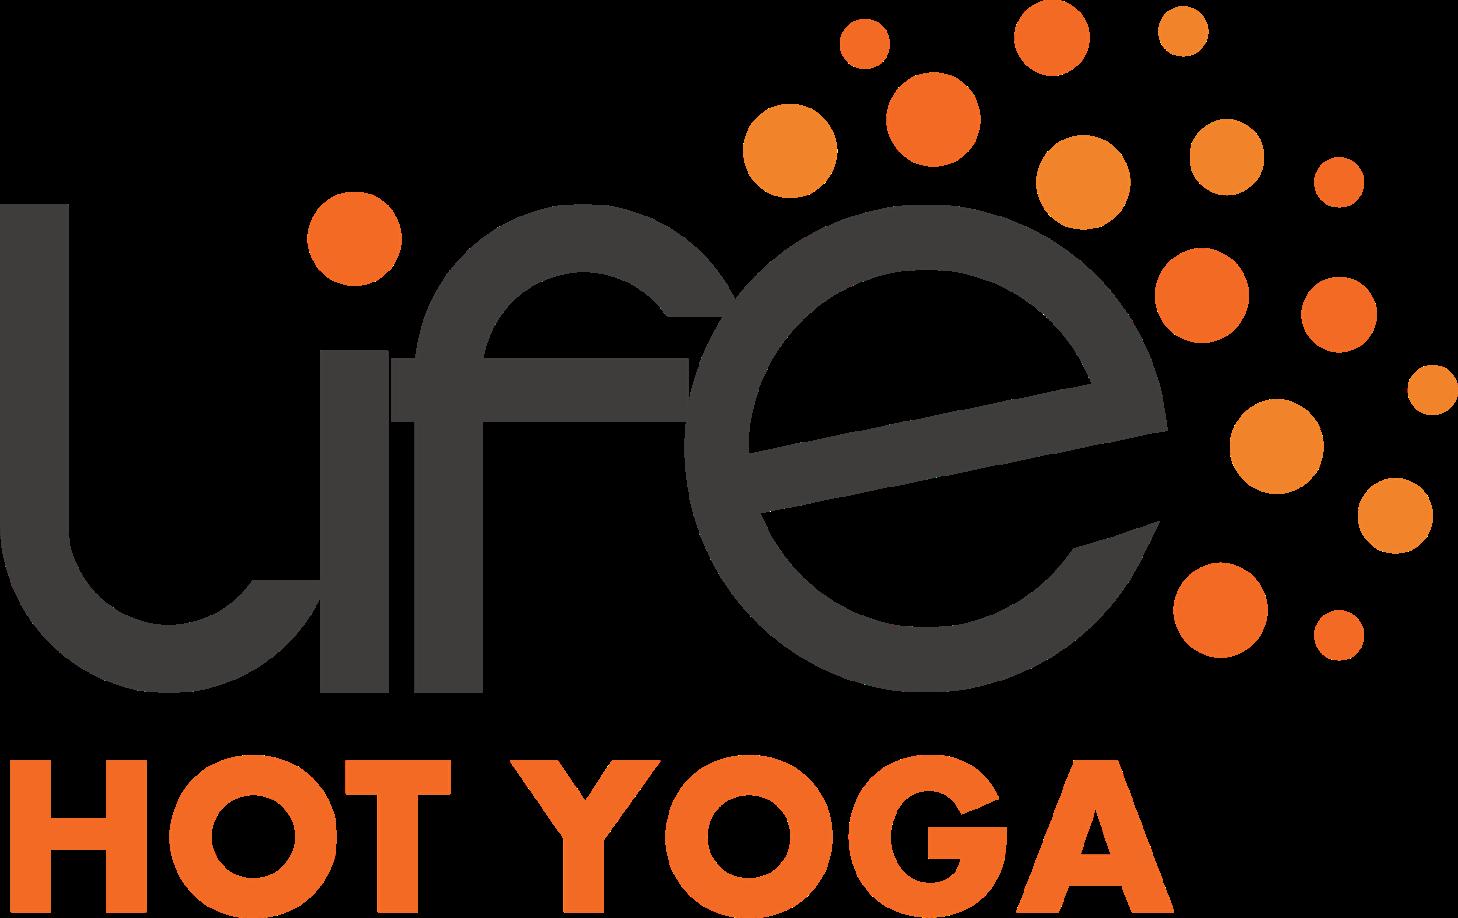 LIFE Hot Yoga – Kuala Lumpur, Malaysia